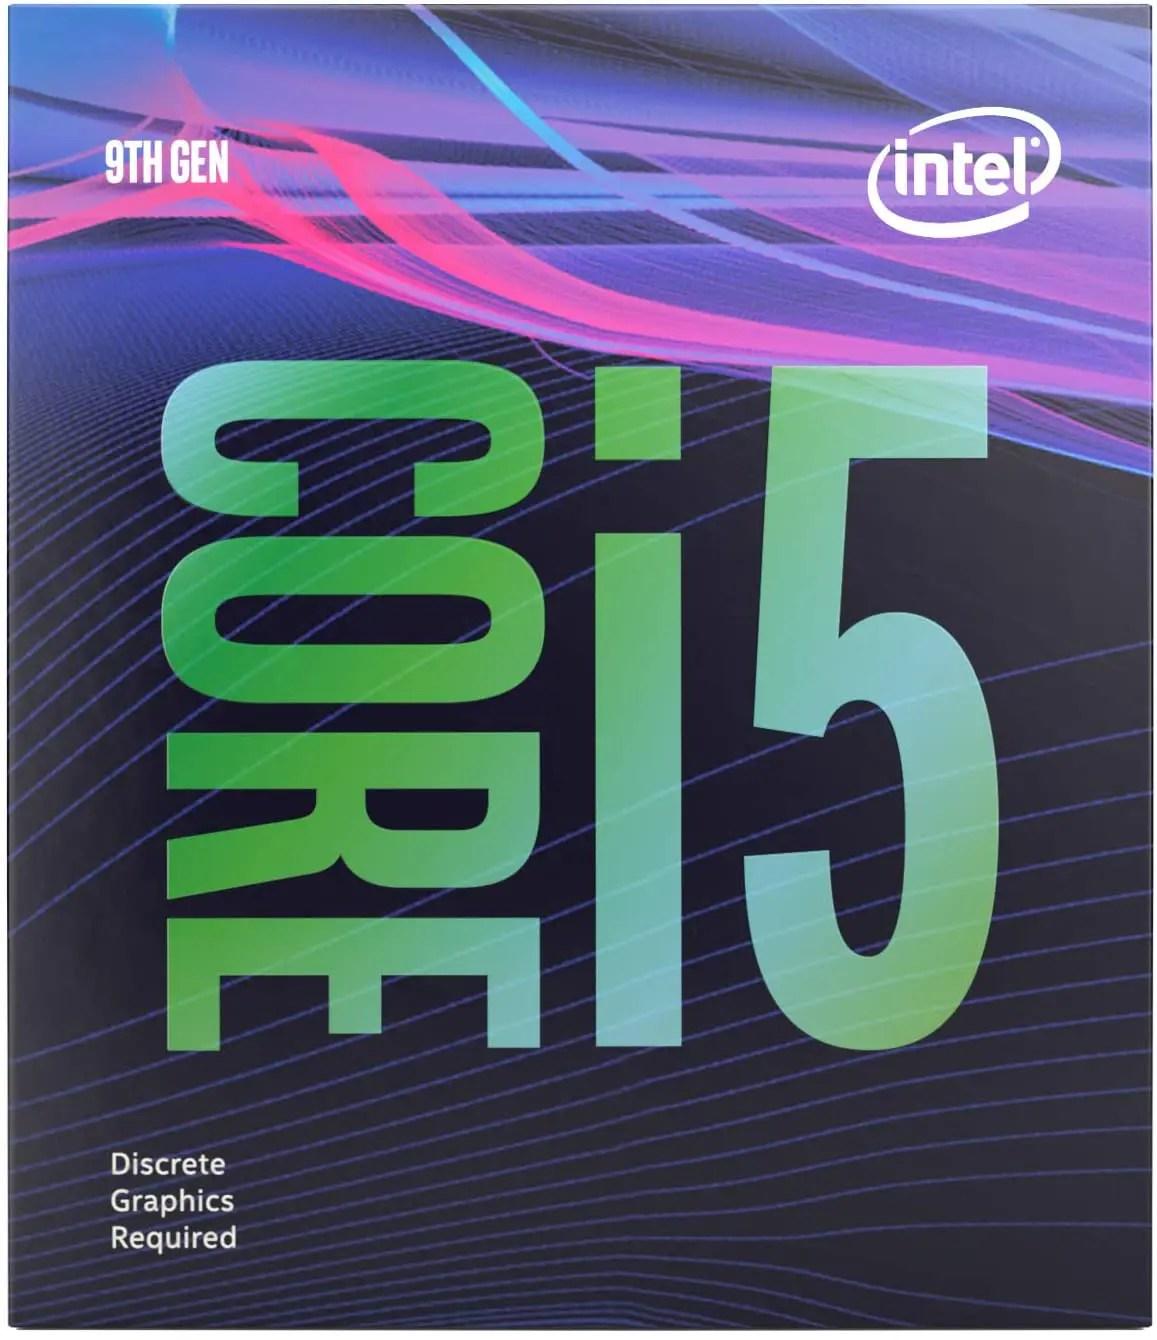 intel core i5 9400f image